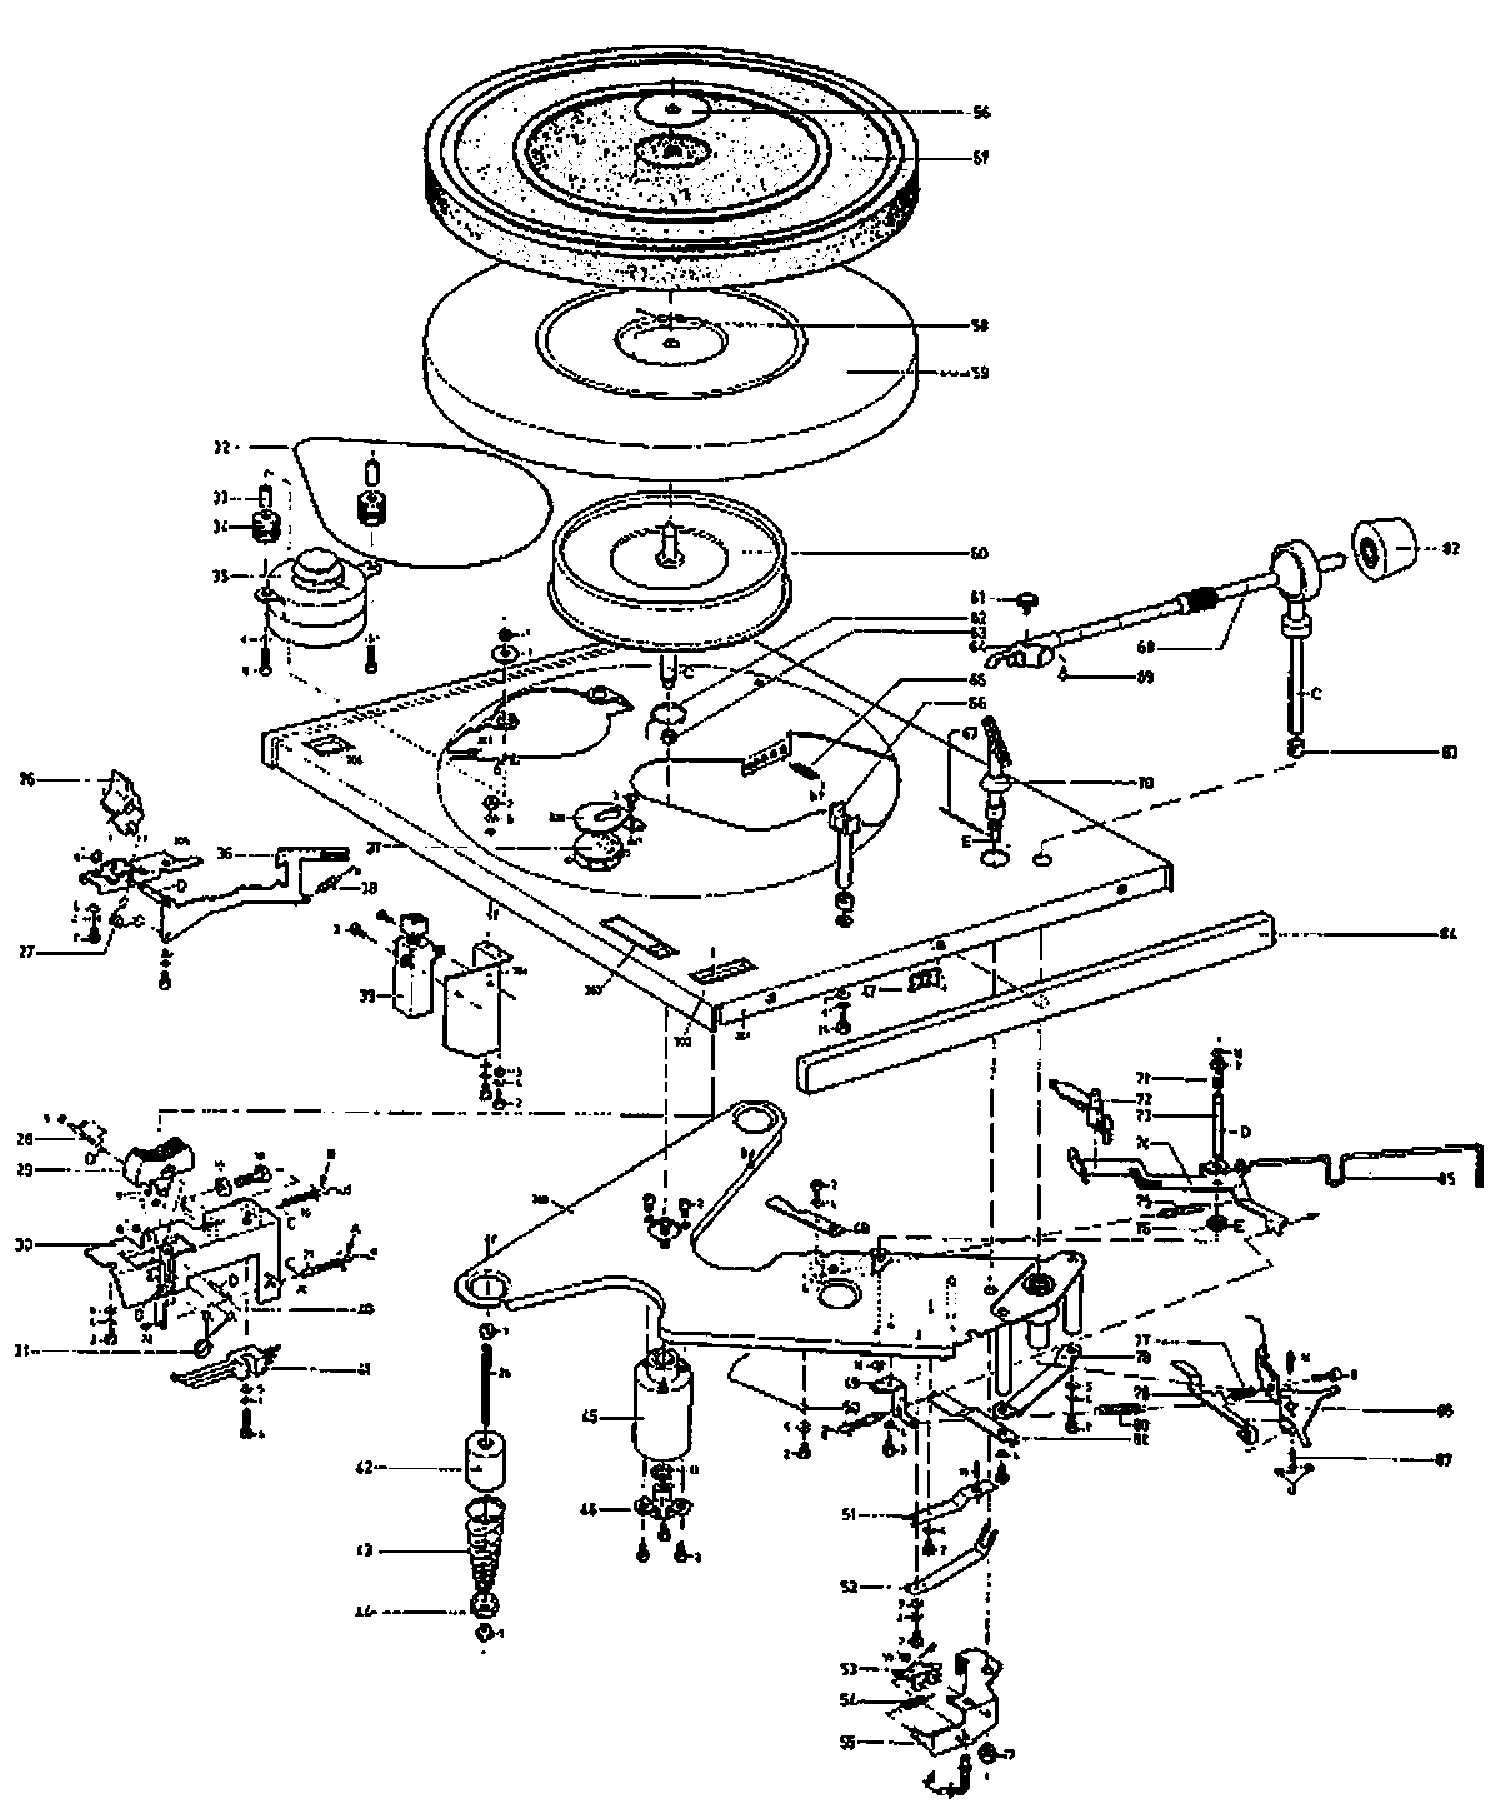 philips n4510 sm service manual download  schematics